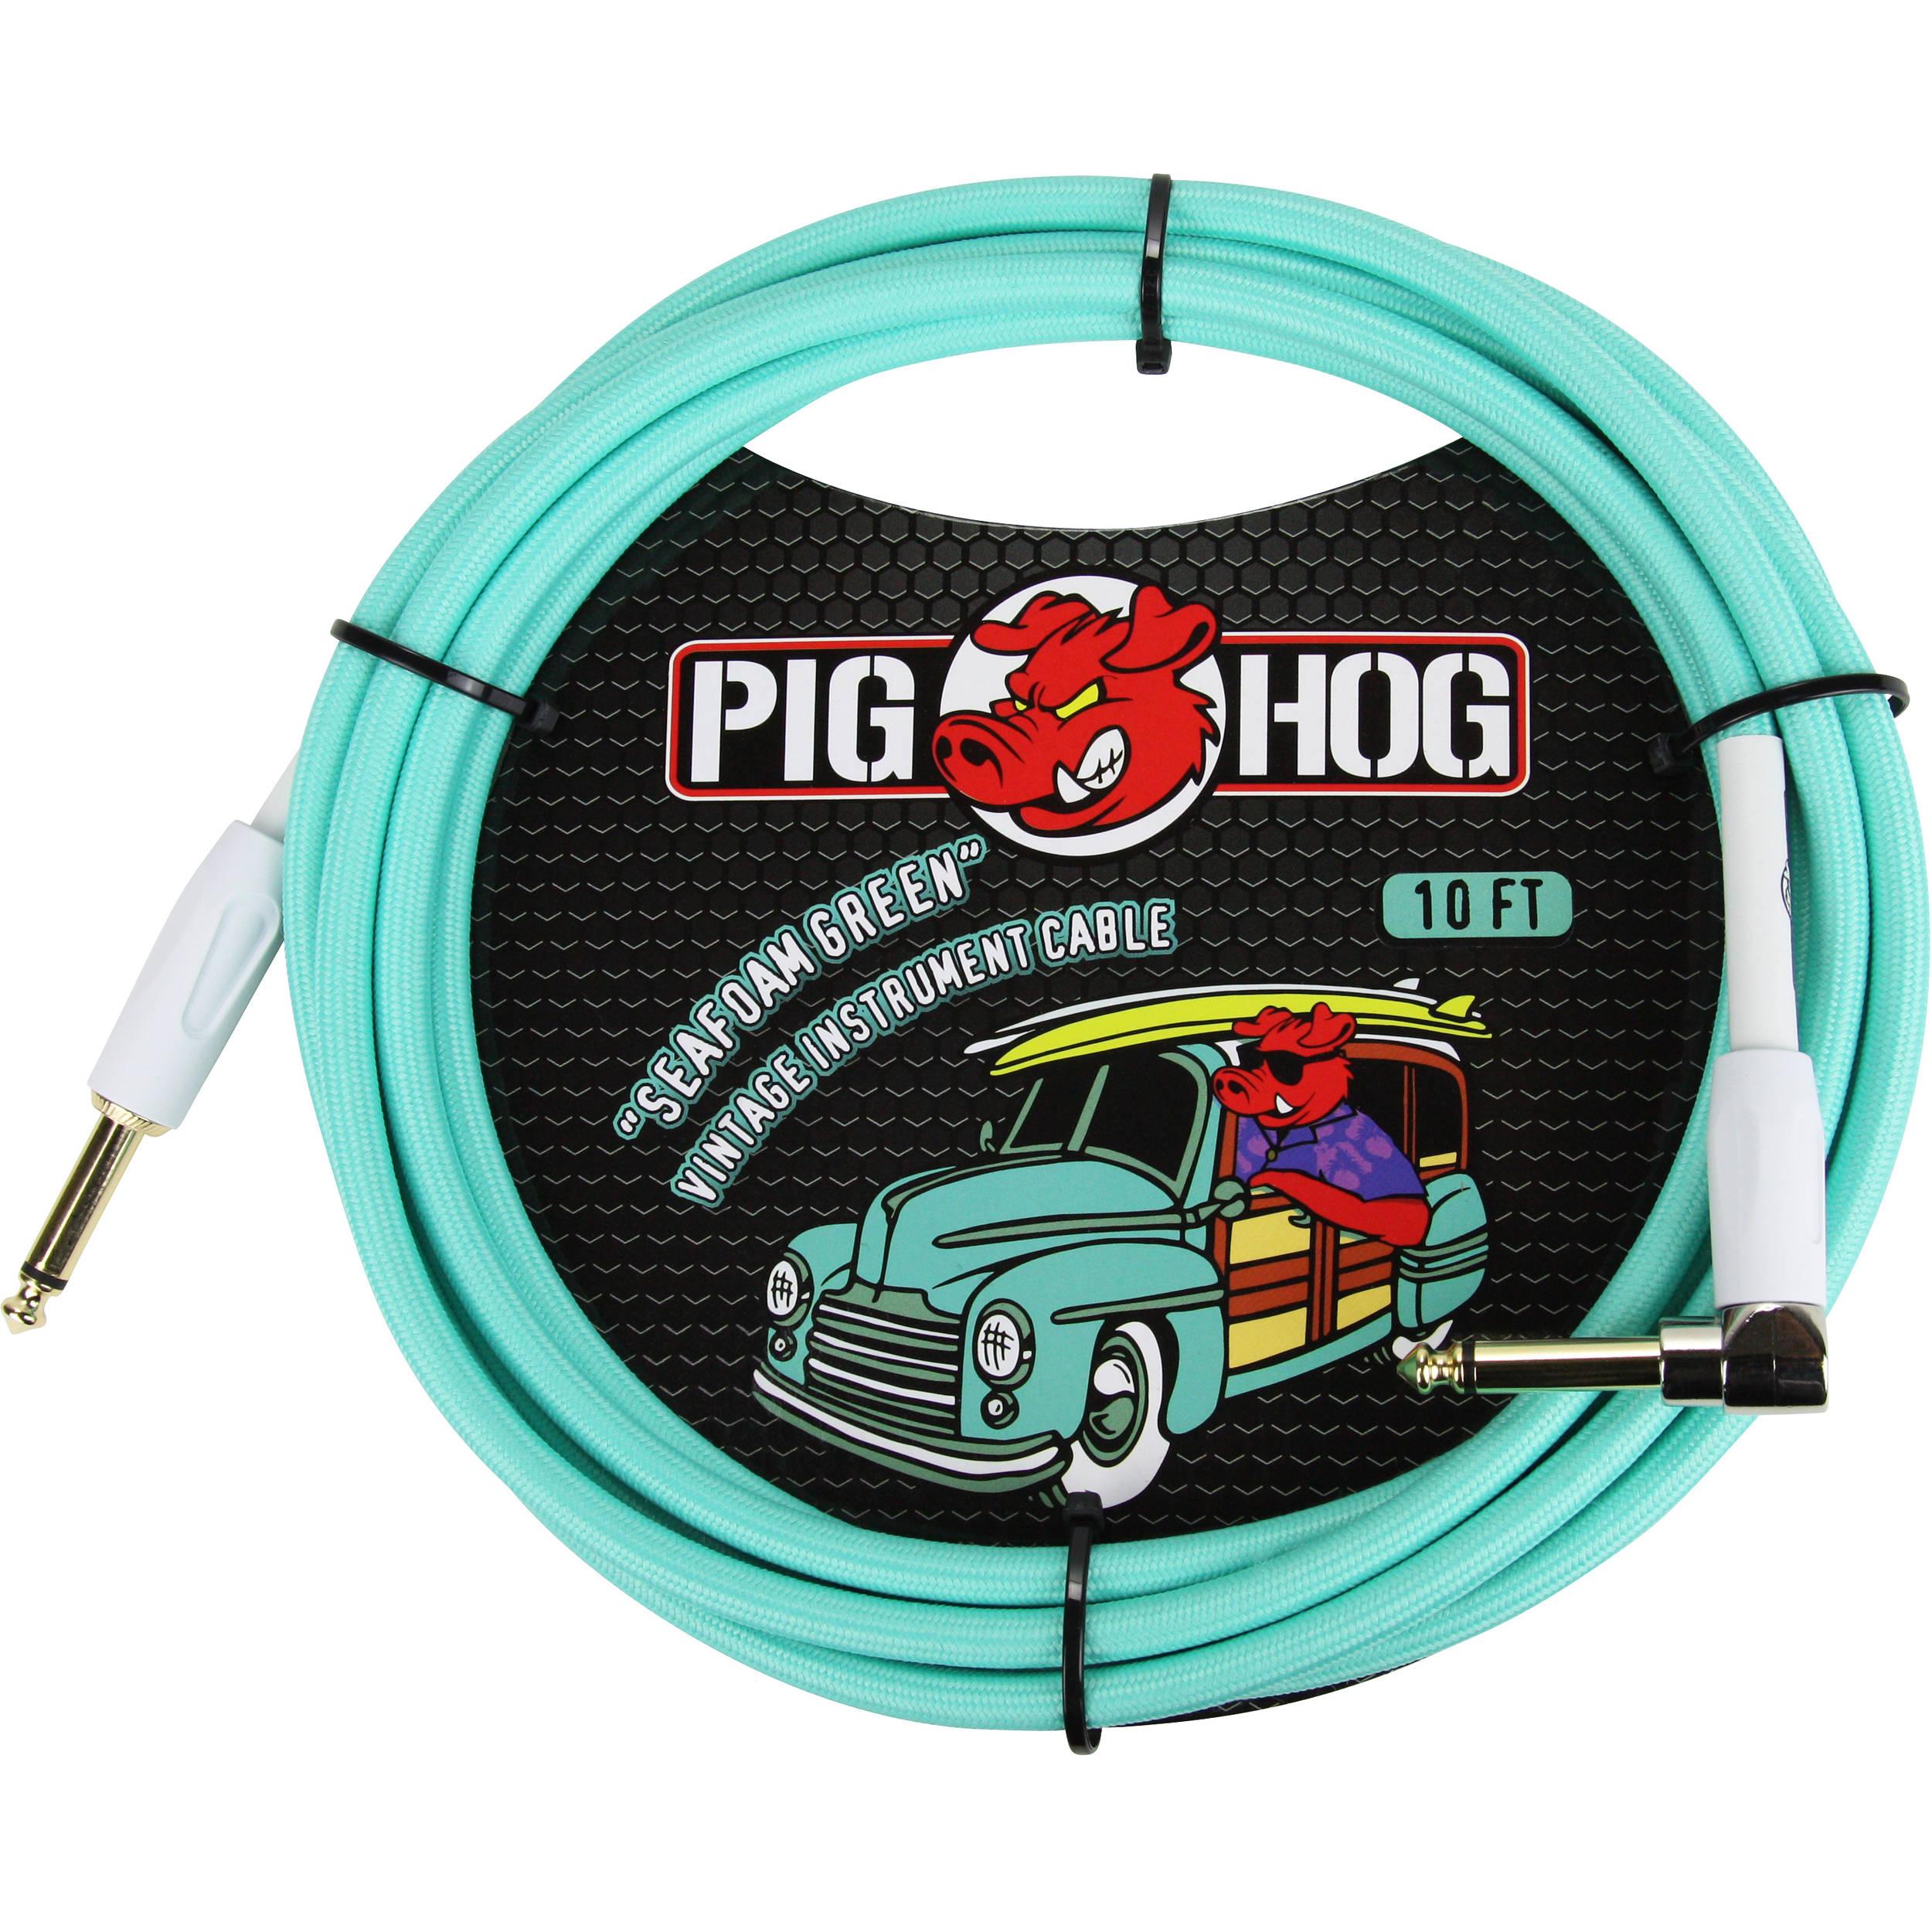 PIG HOG 10 FT SEAFOAM GREEN